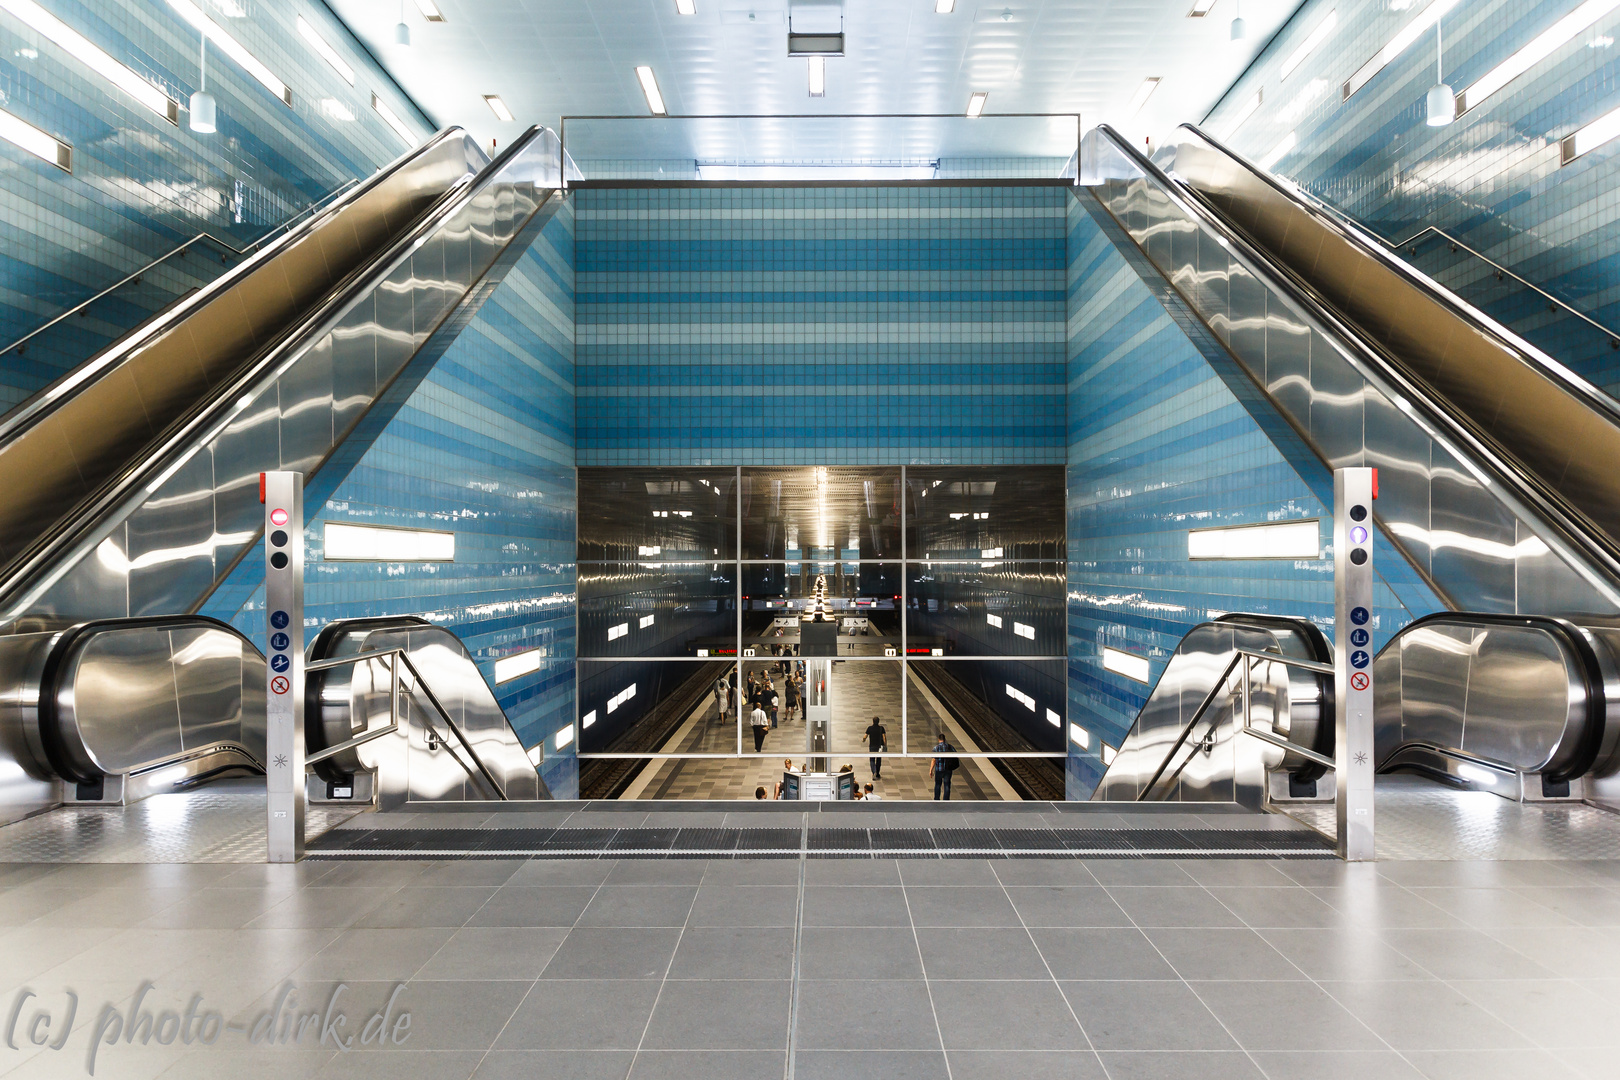 U-Bahn Station Hamburg-Überseequartier